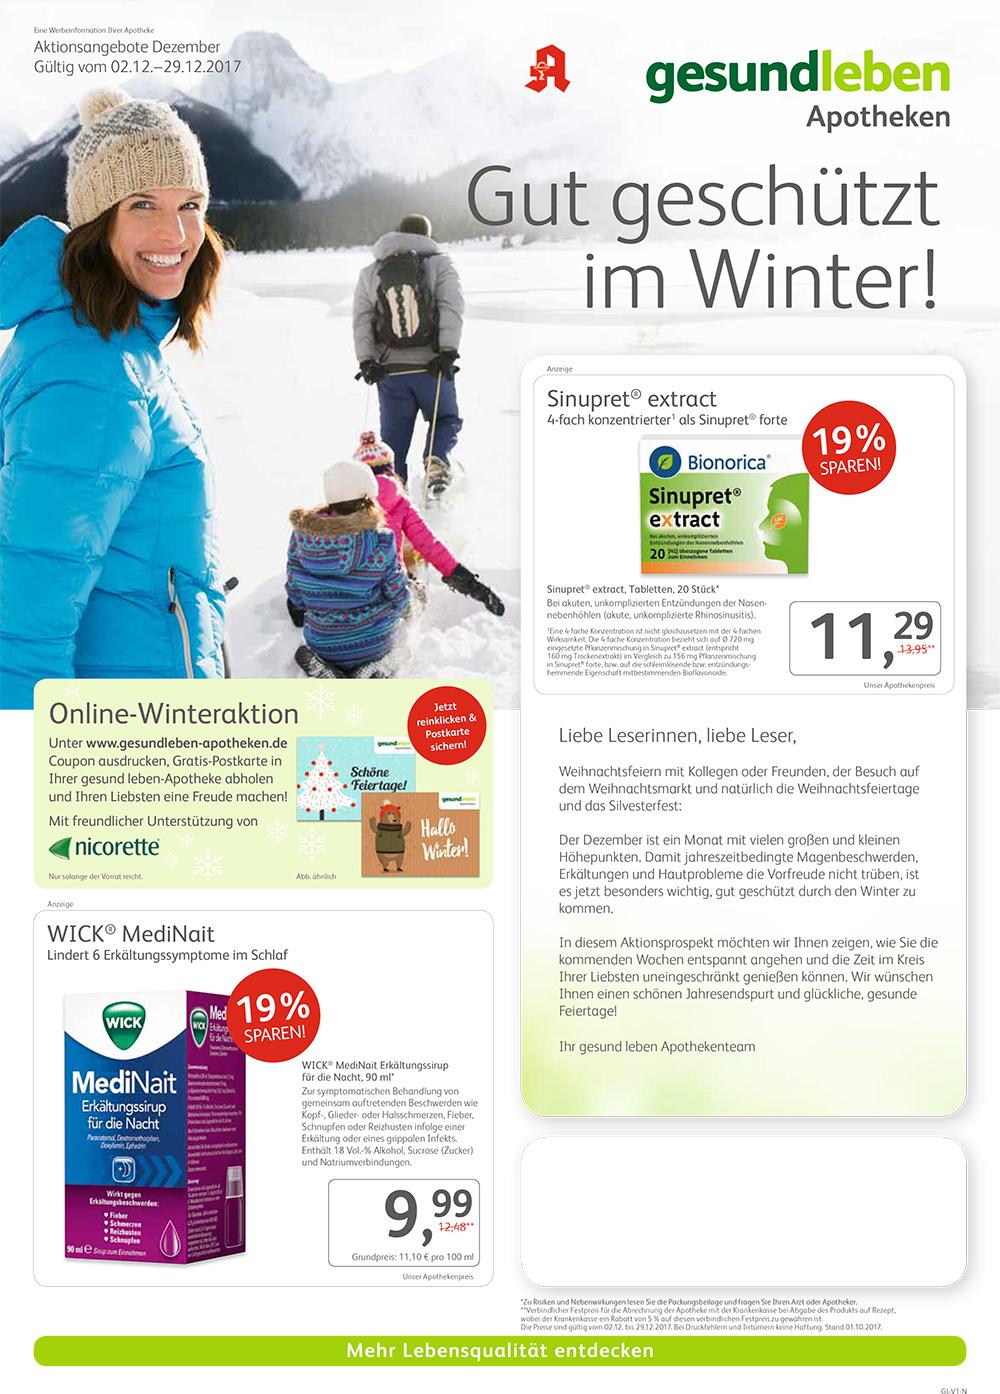 http://www.apotheken.de/fileadmin/clubarea/00000-Angebote/67459_neue_angebot_1.jpg